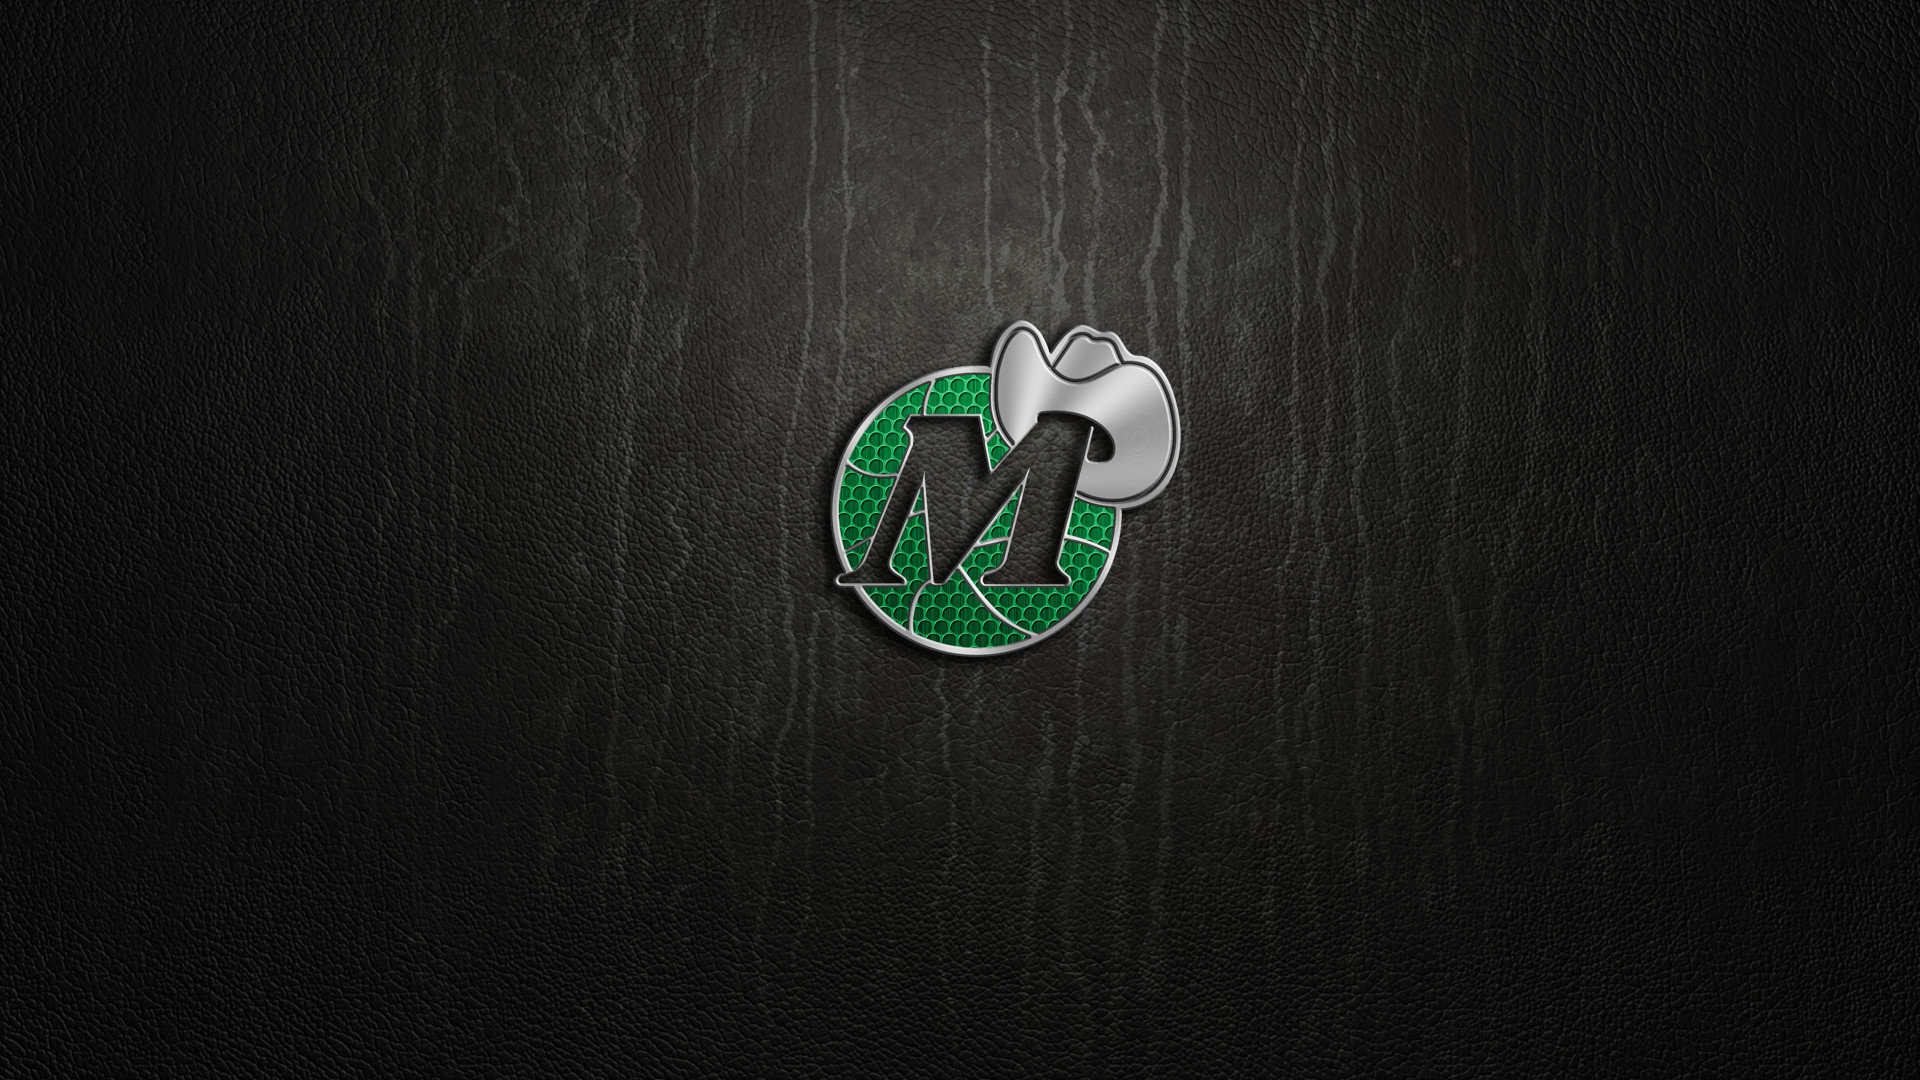 Free Download Dallas Mavericks Wallpaper ID48011 Full Hd For Desktop